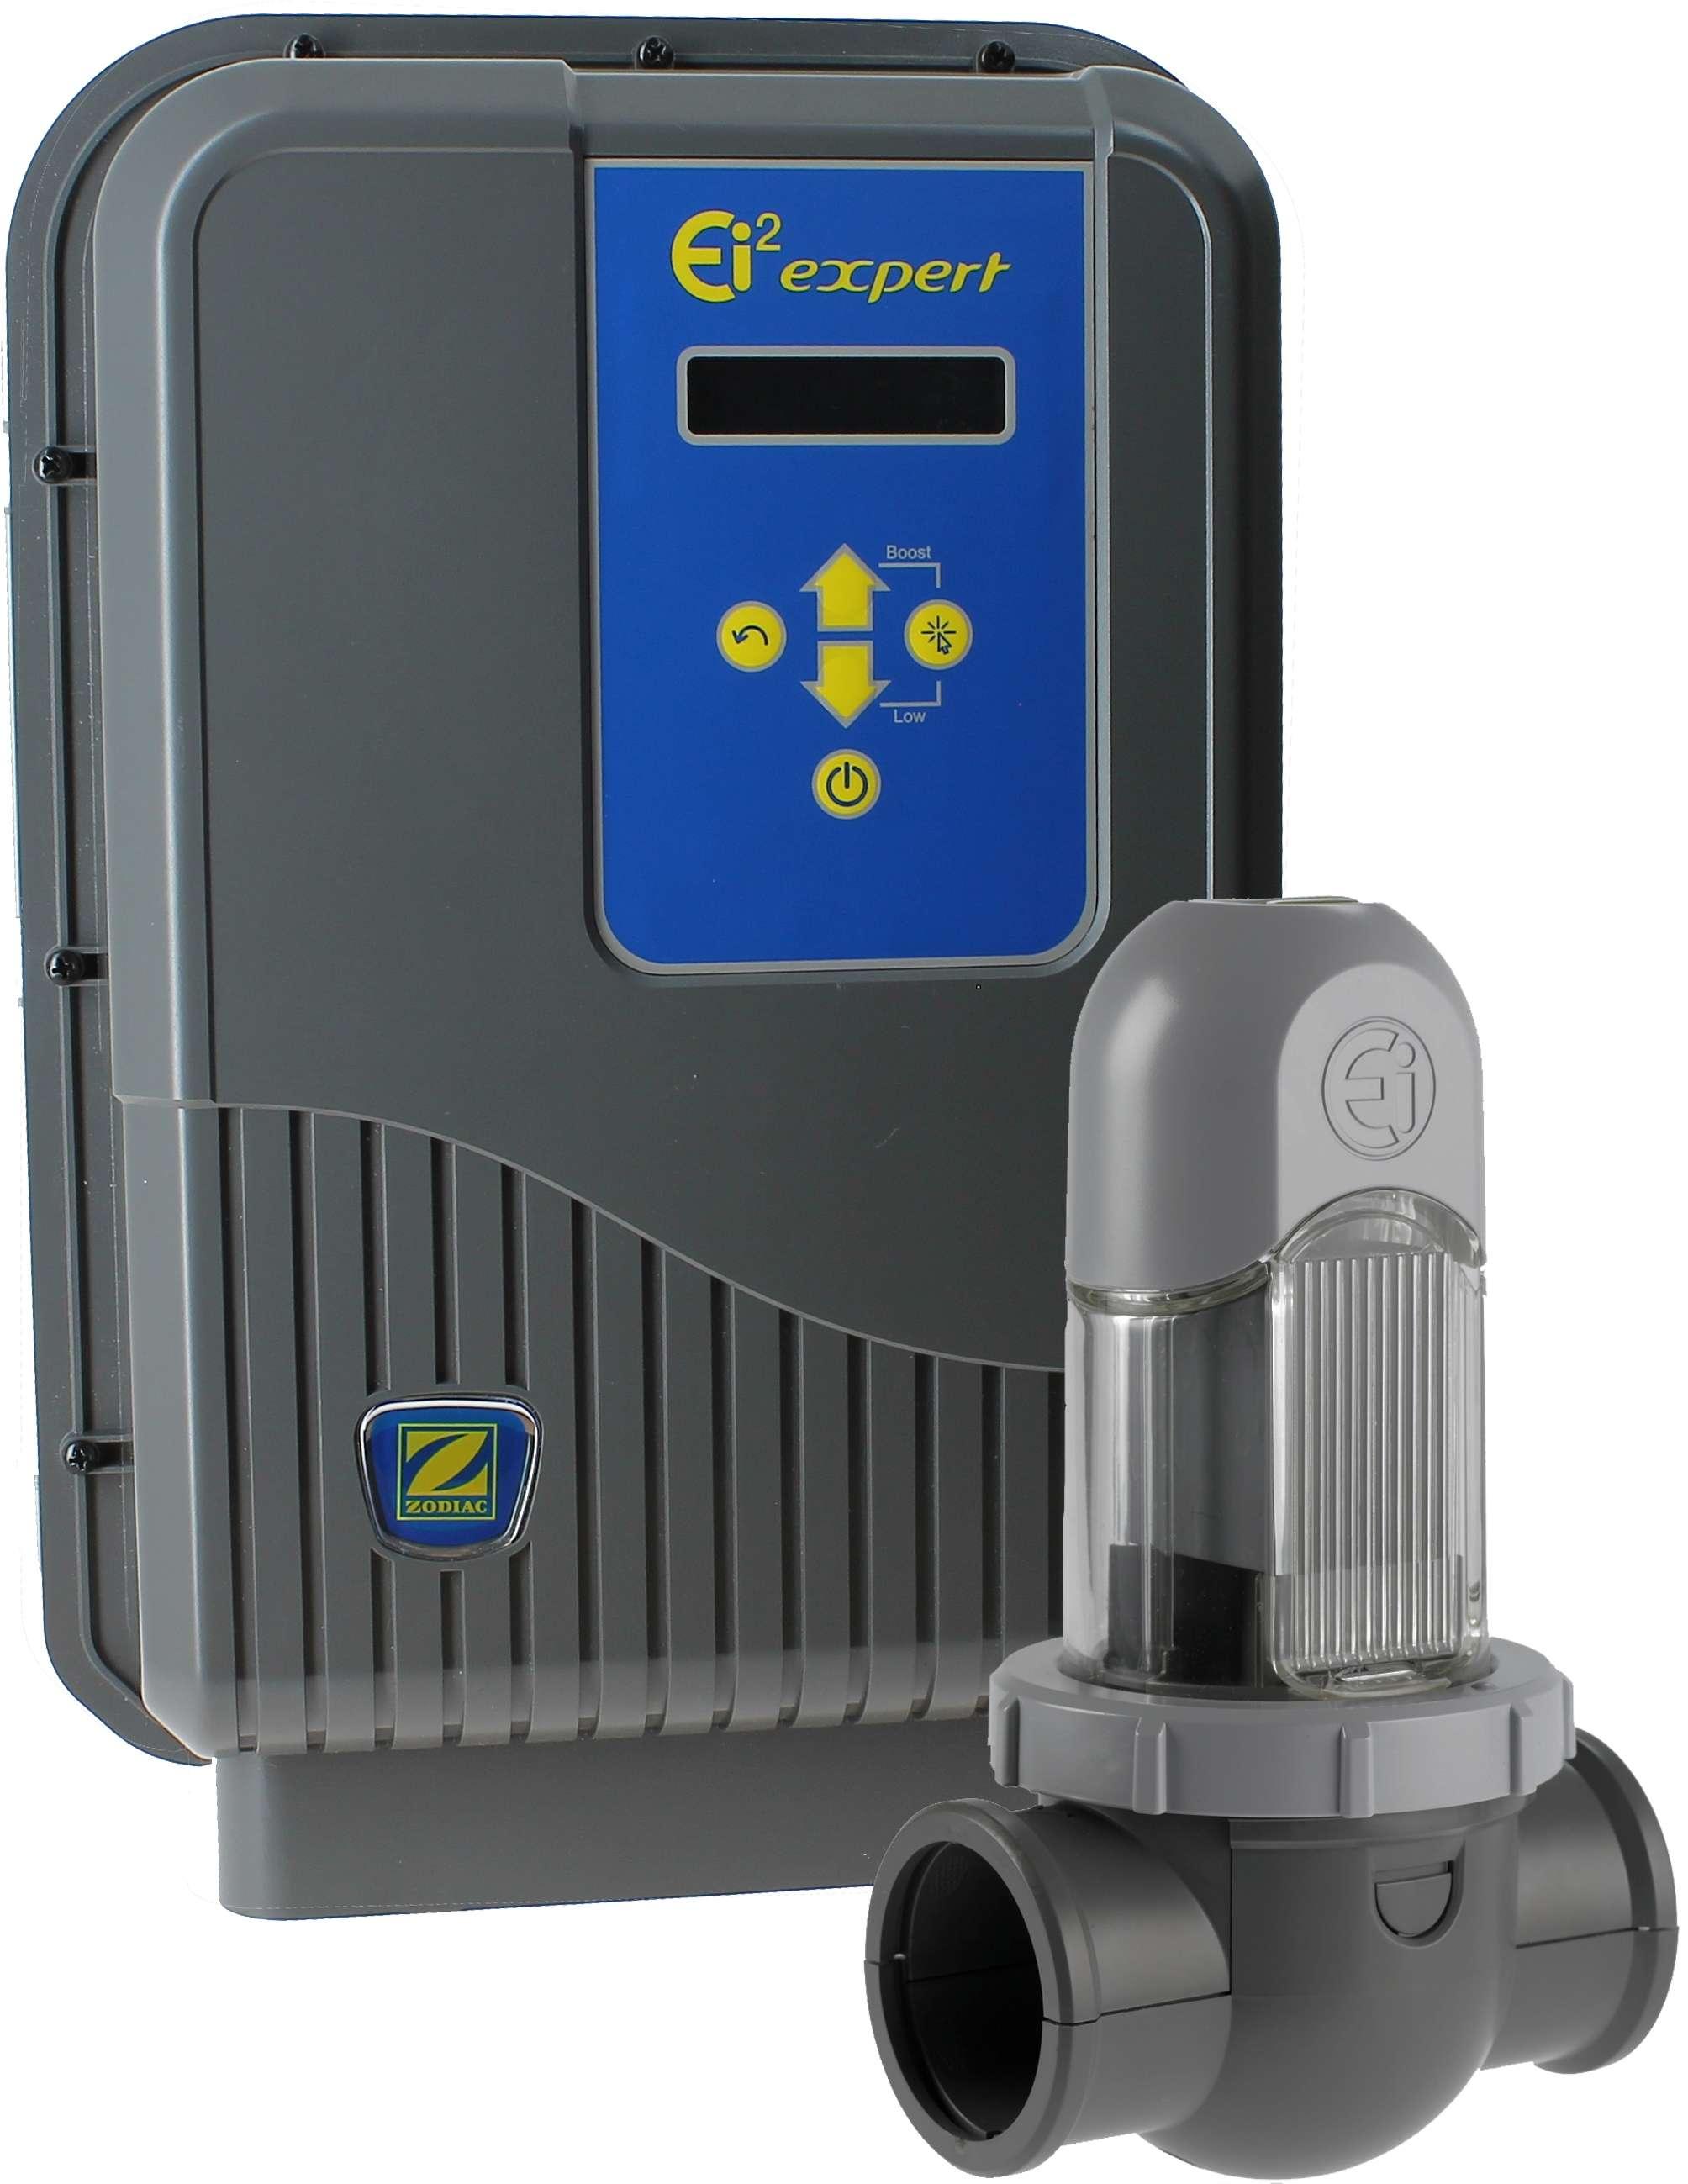 Ei2 expert 10 40 m3 clorador salino piscinas lara for Reloj programador piscina precio